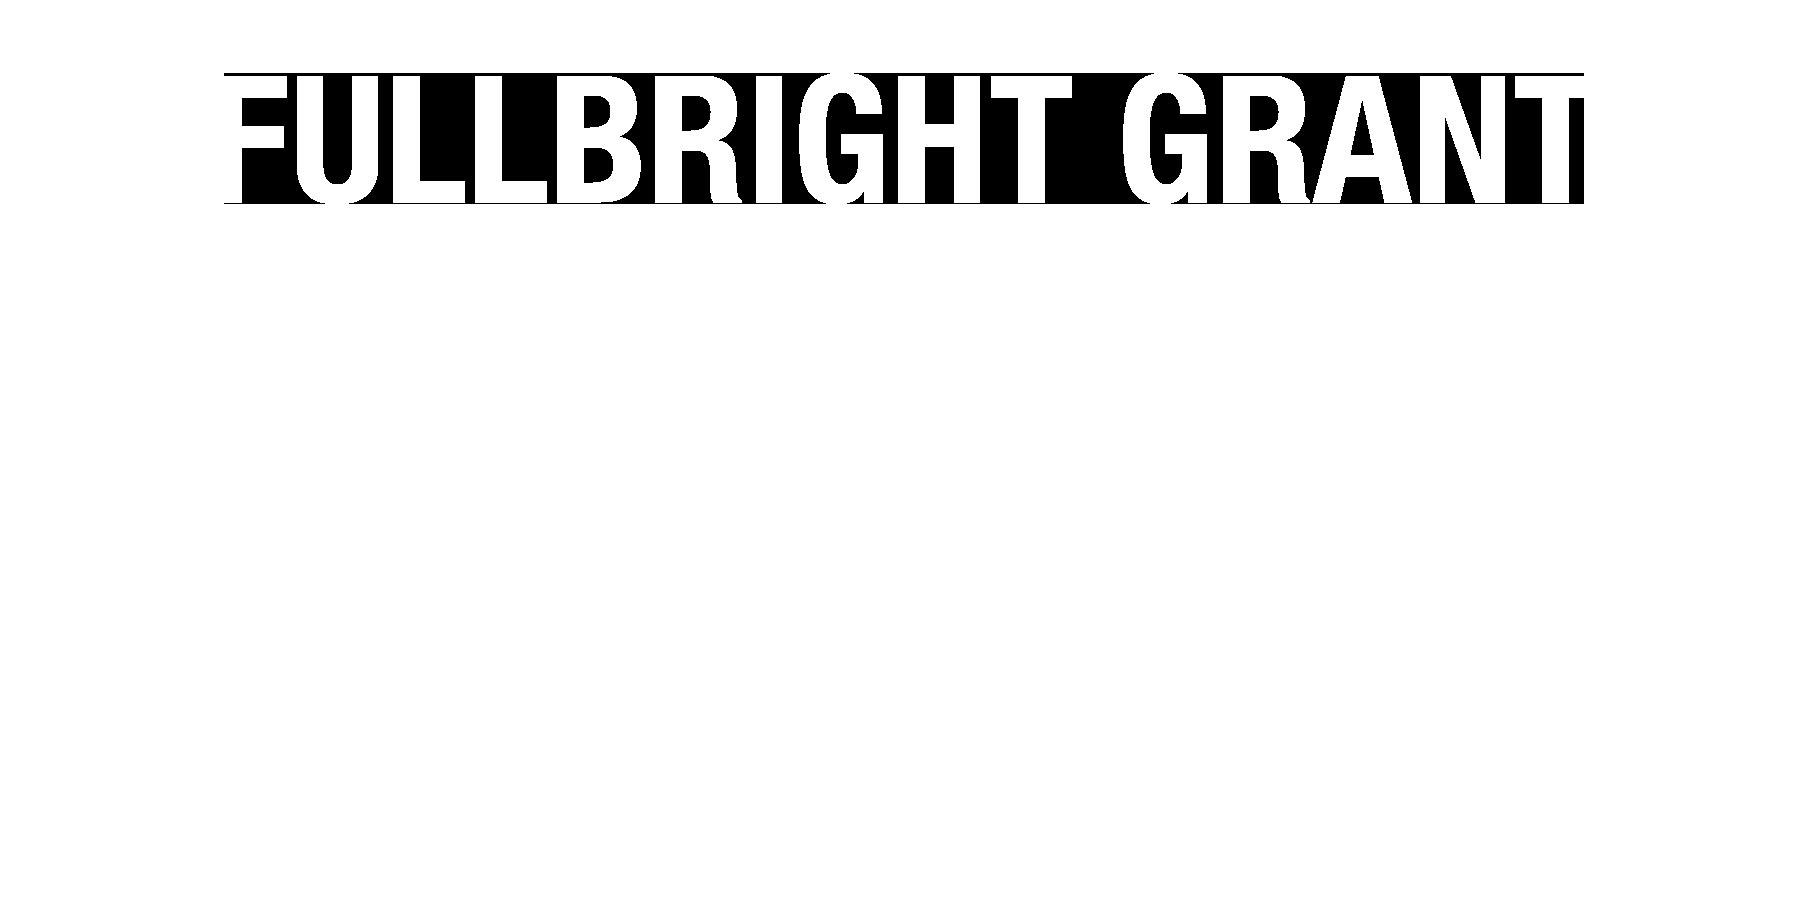 fullbright_grant_logo_.png